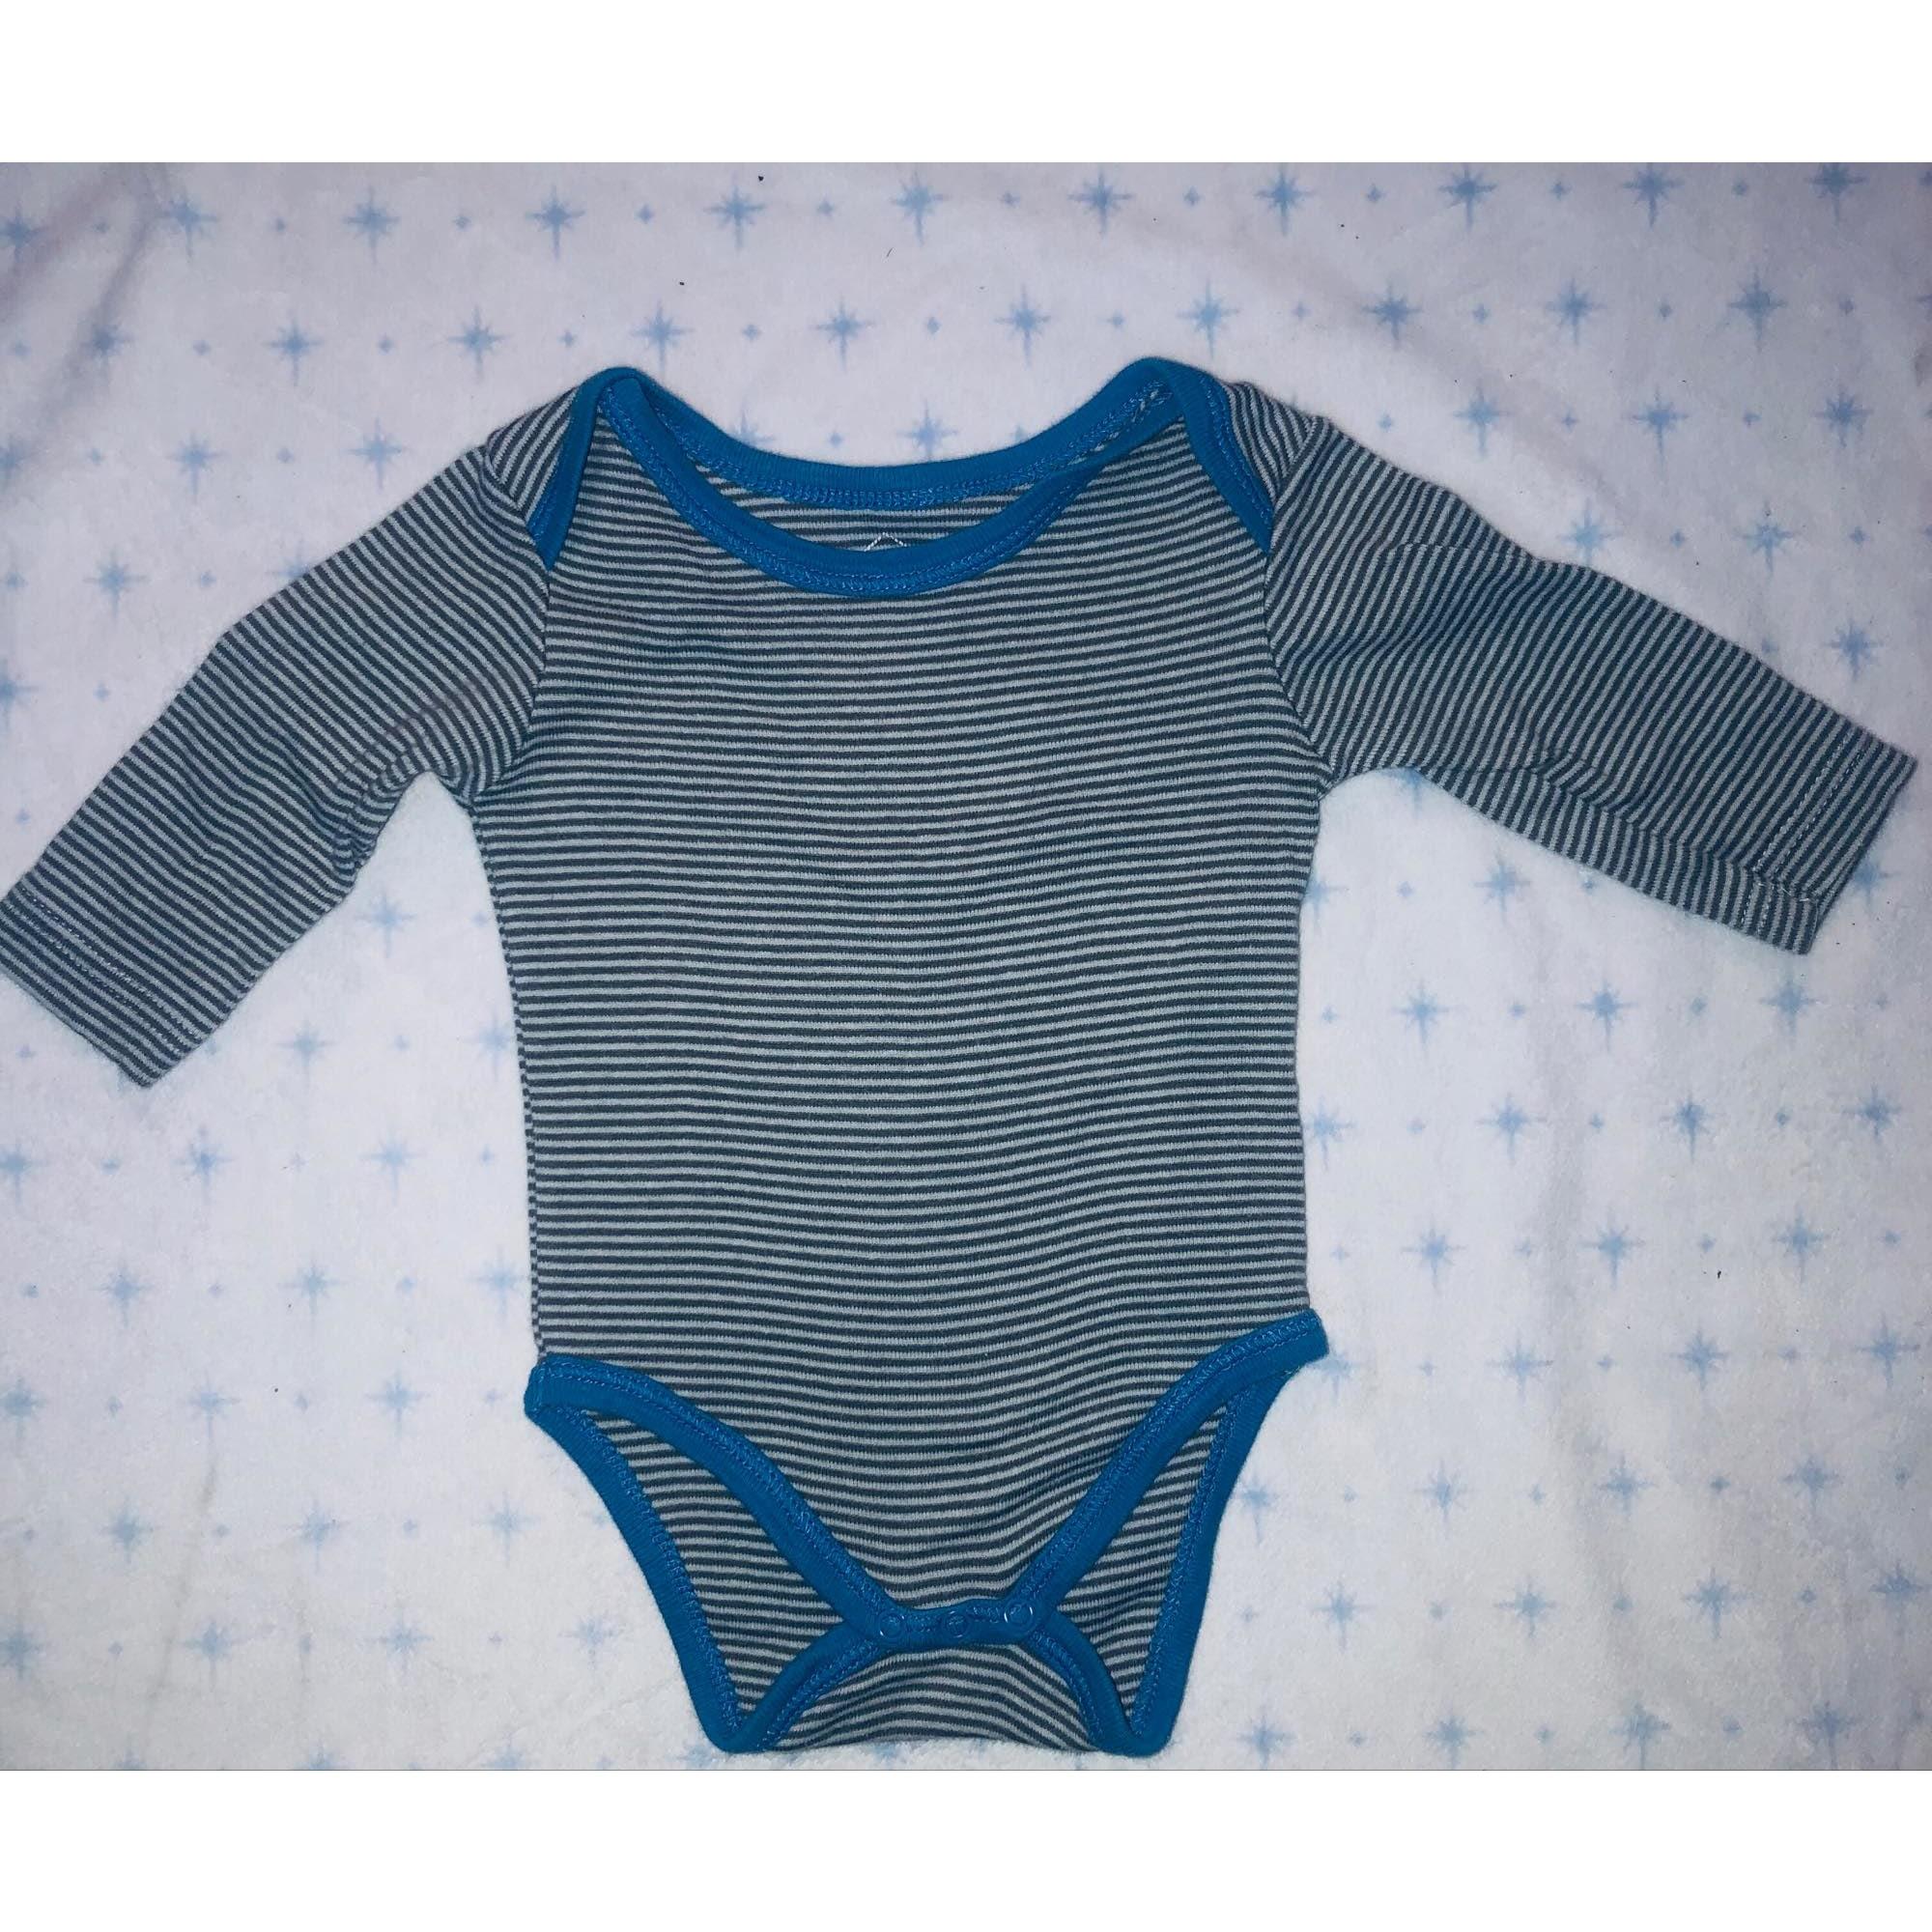 Body MARQUE INCONNUE Bleu, bleu marine, bleu turquoise